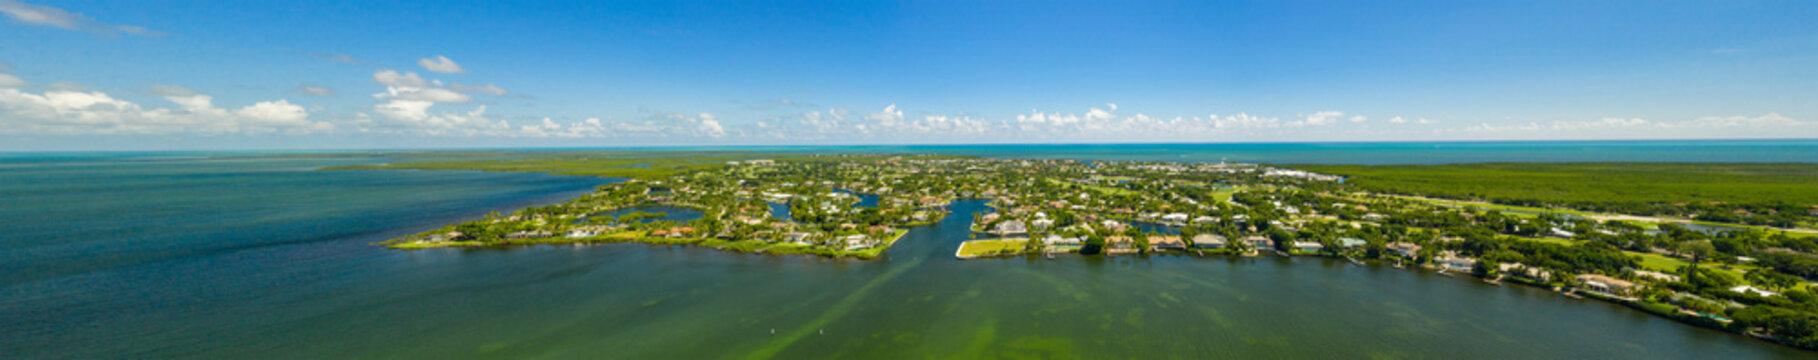 Aerial panorama Ocean Reef Club North Key Largo Florida